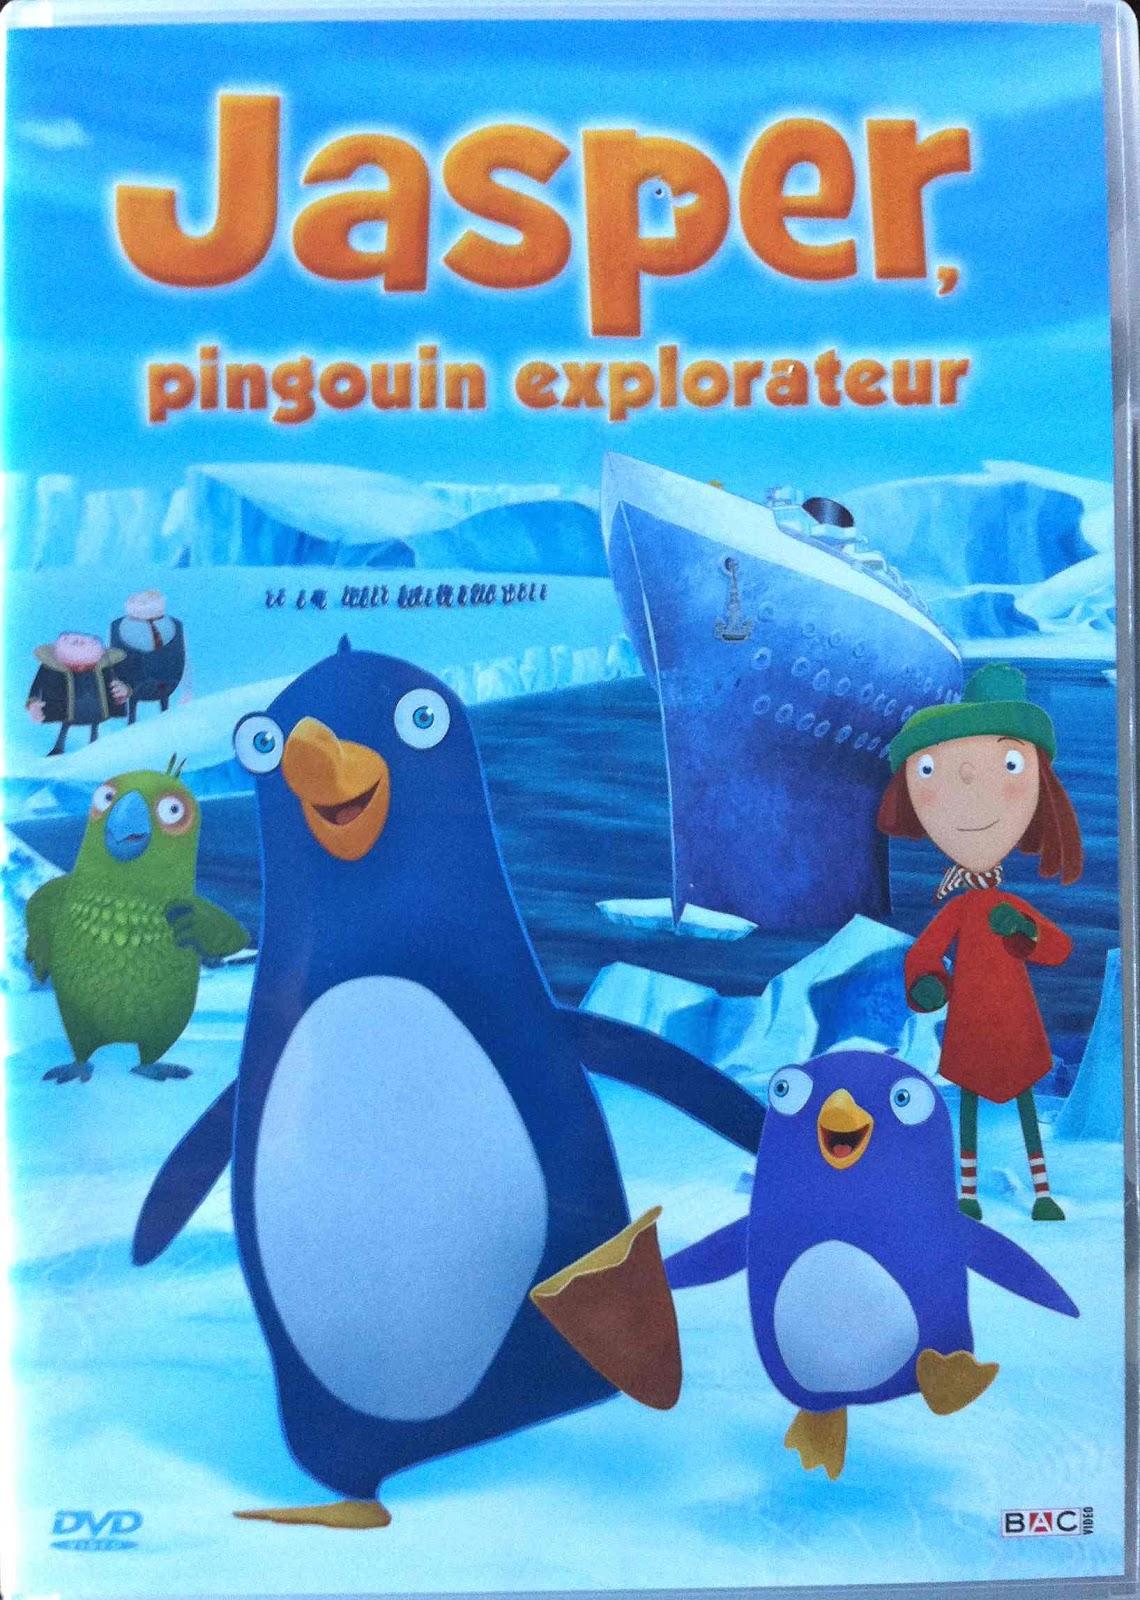 Magic doudou club jasper pingouin explorateur test dvd - Jasper le pingouin ...